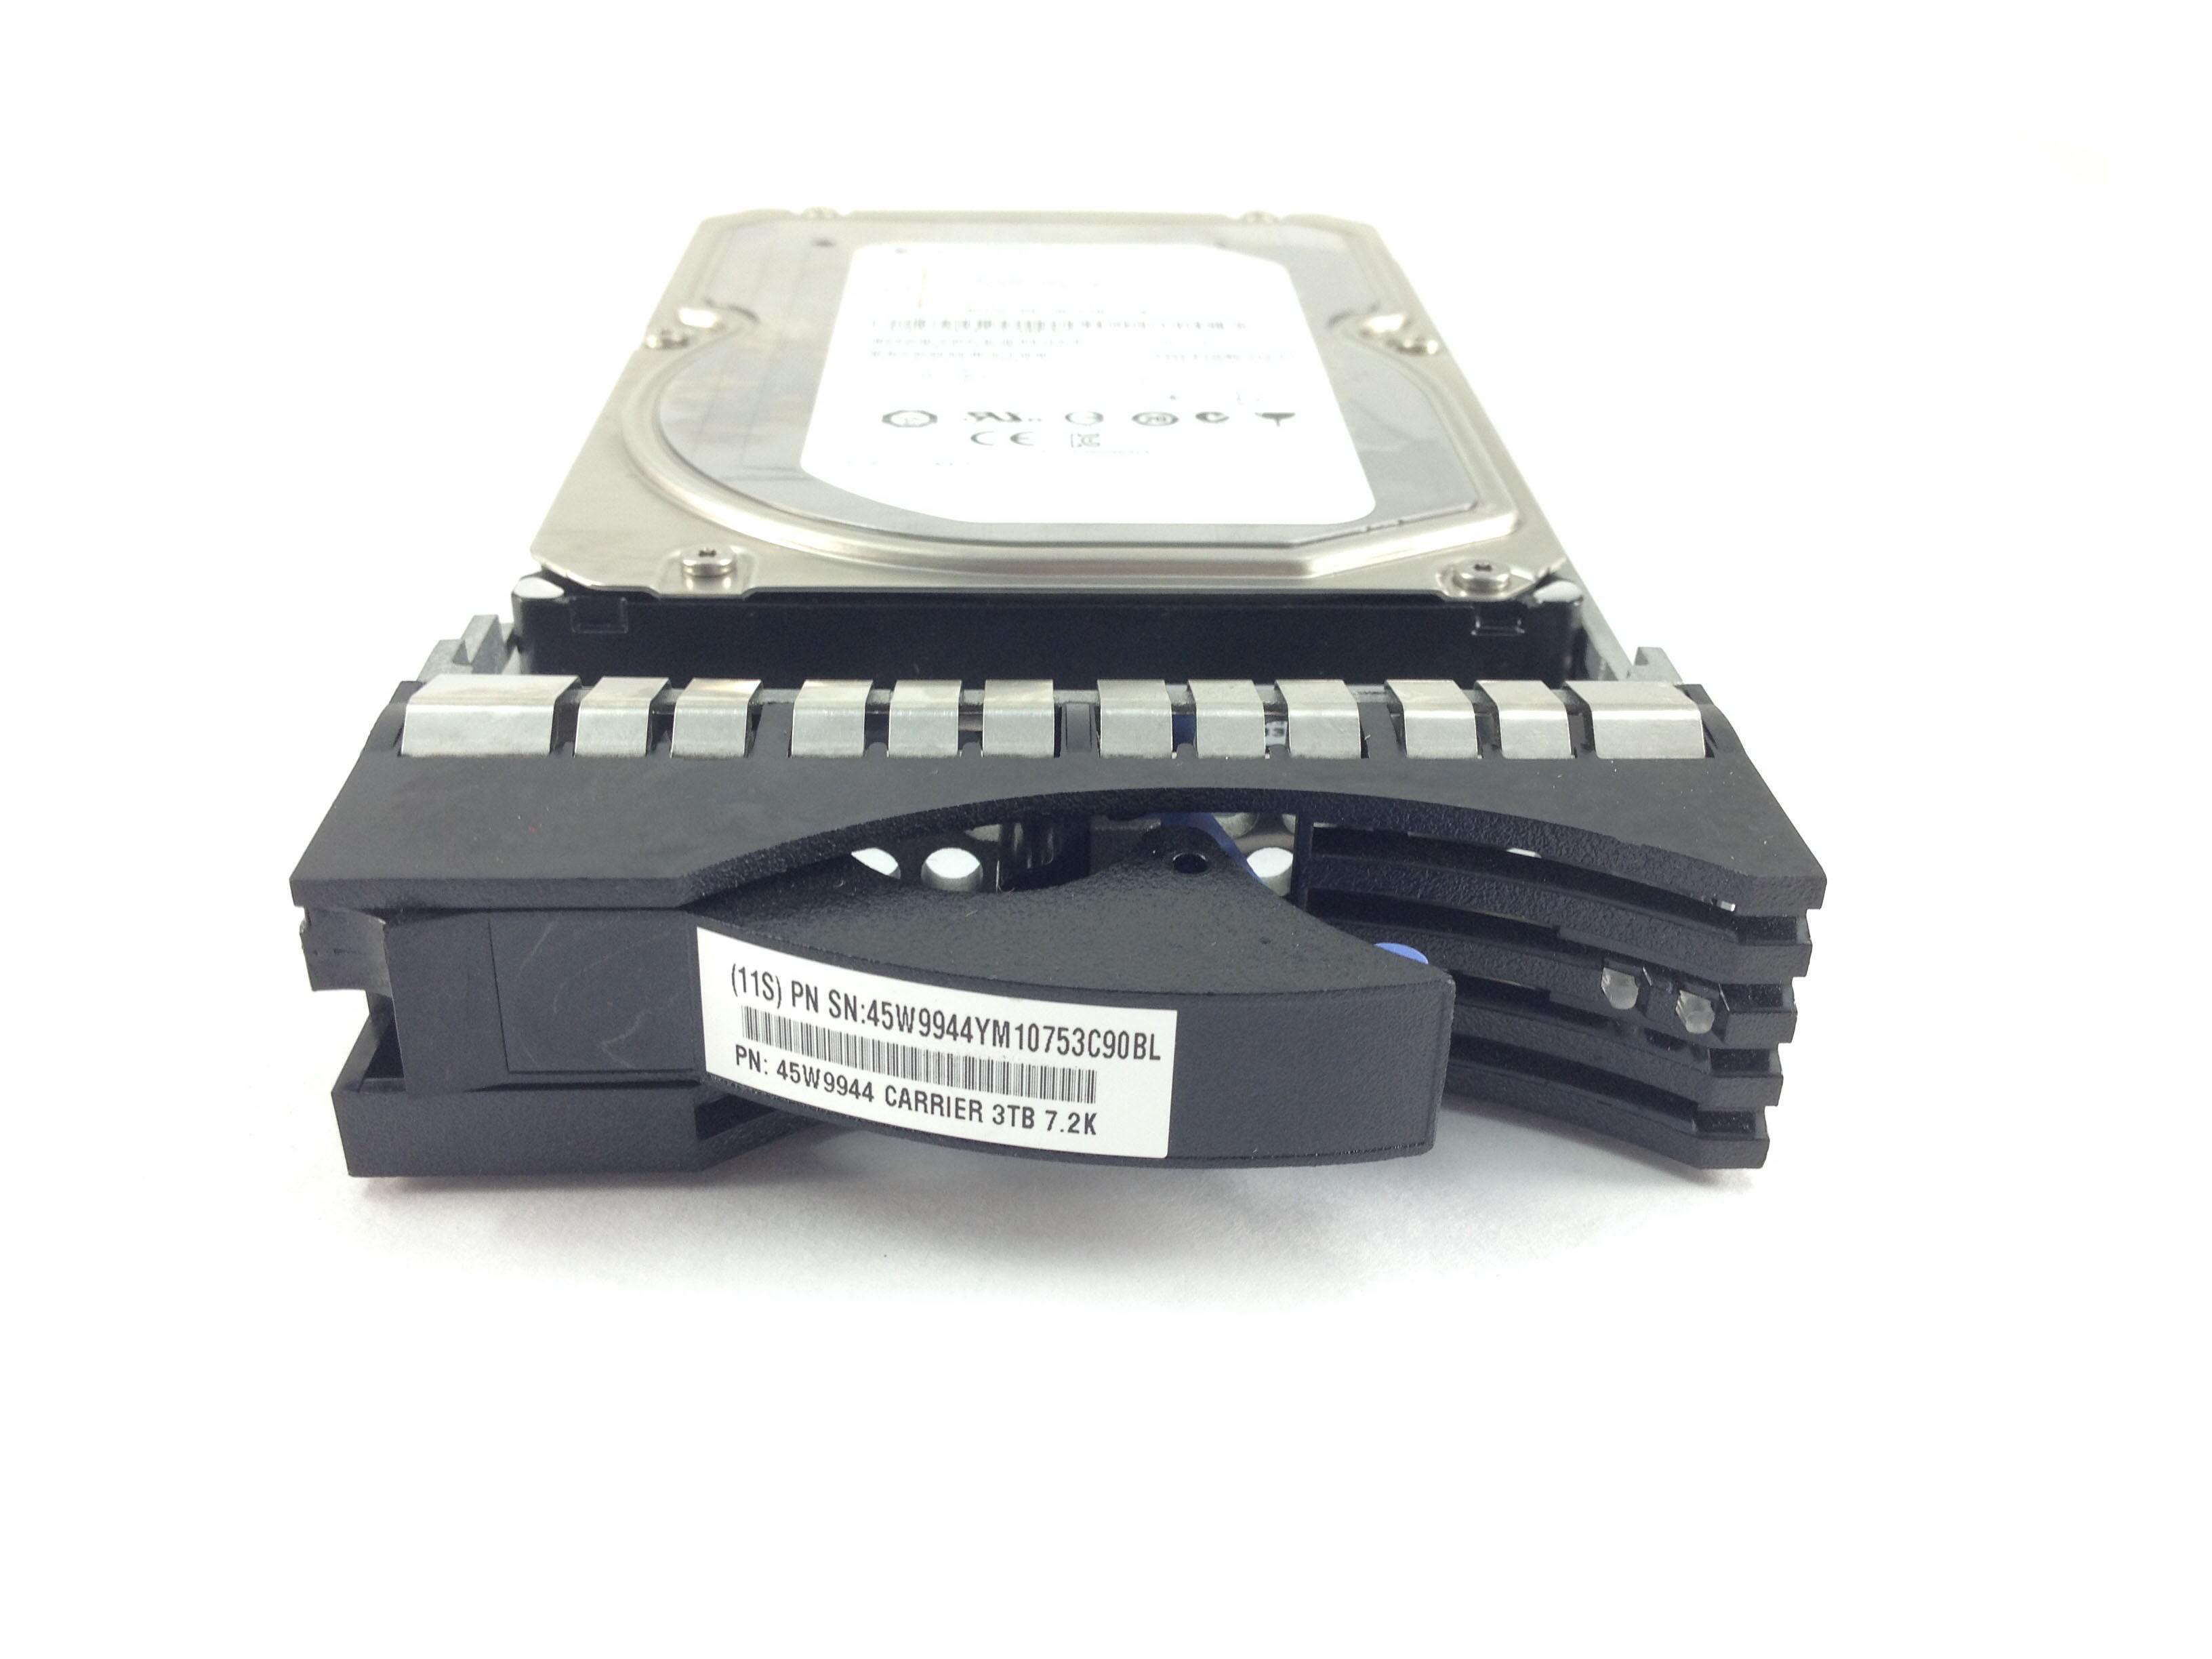 IBM Seagate 3TB 7.2K 6Gbps SAS 3.5'' Hard Drive w/ Tray (45W9944)